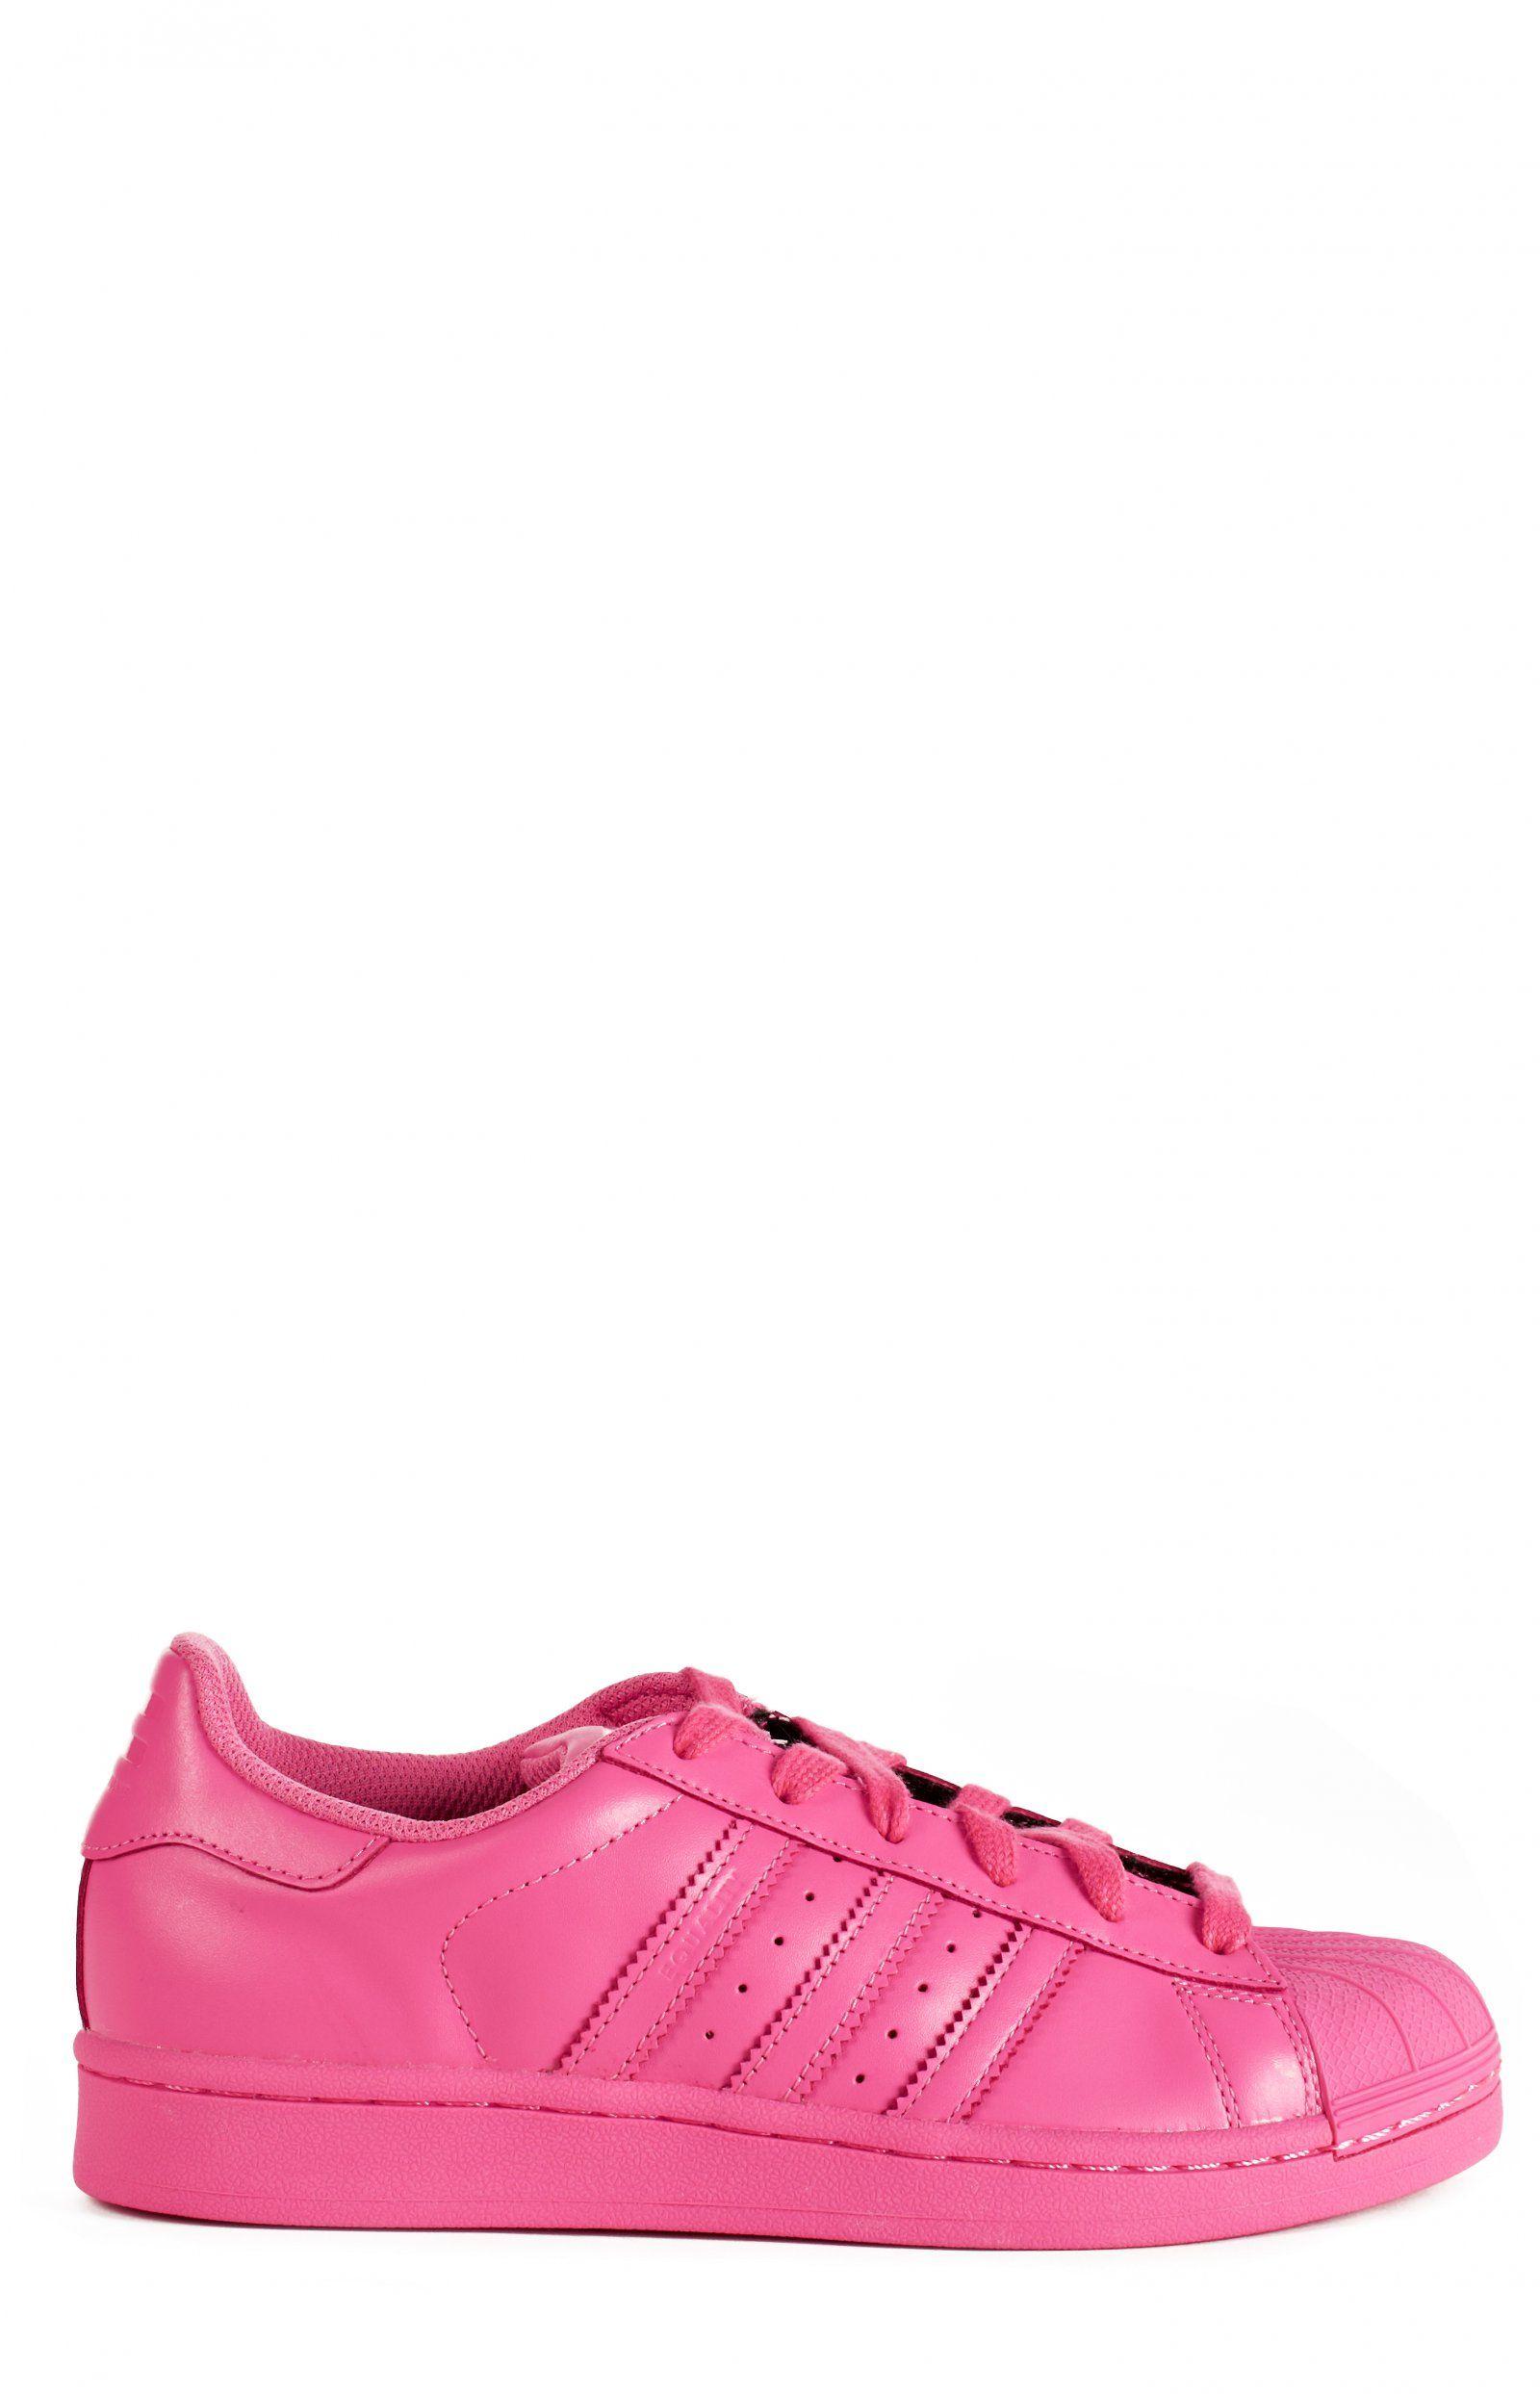 Superstar Supercolor Pack Rosa Pharrell Williams x x Williams Adidas 21075a